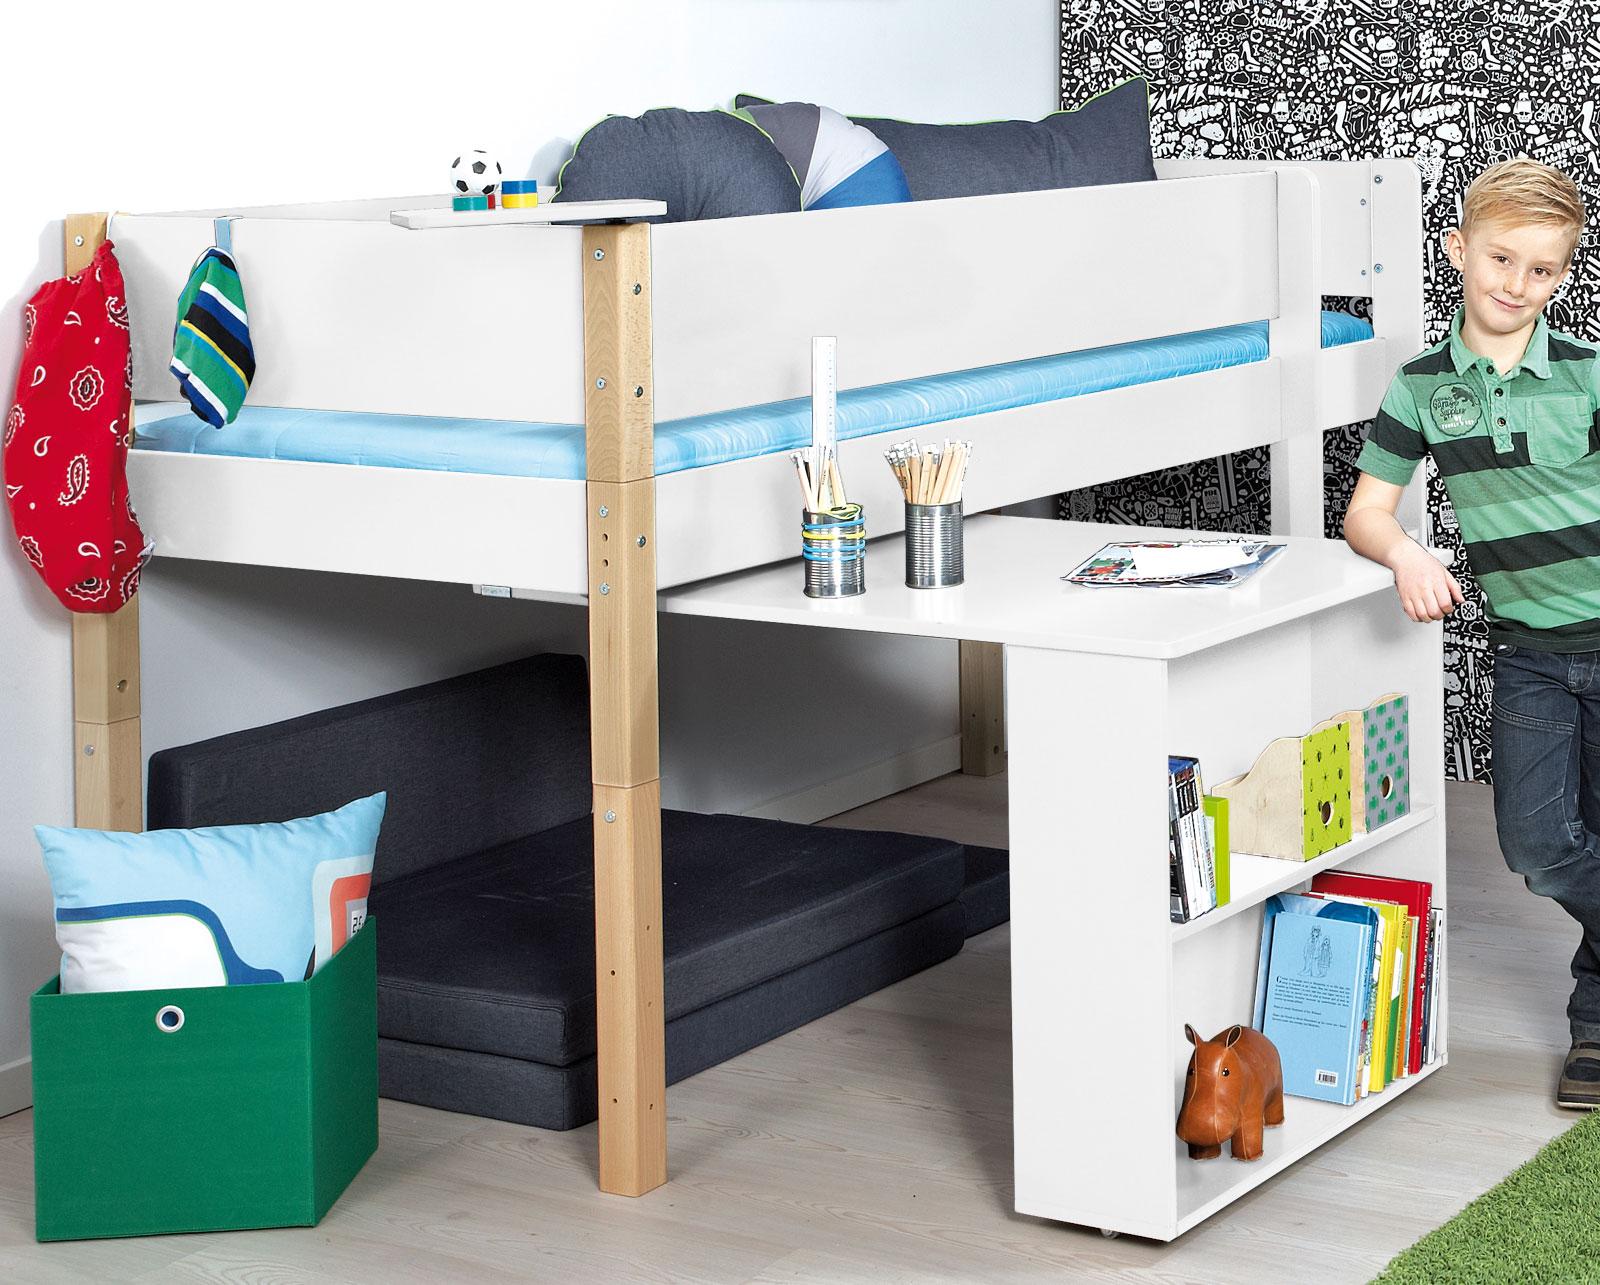 mini hochbett mini hochbett mit rutsche t v gepr ft kids. Black Bedroom Furniture Sets. Home Design Ideas